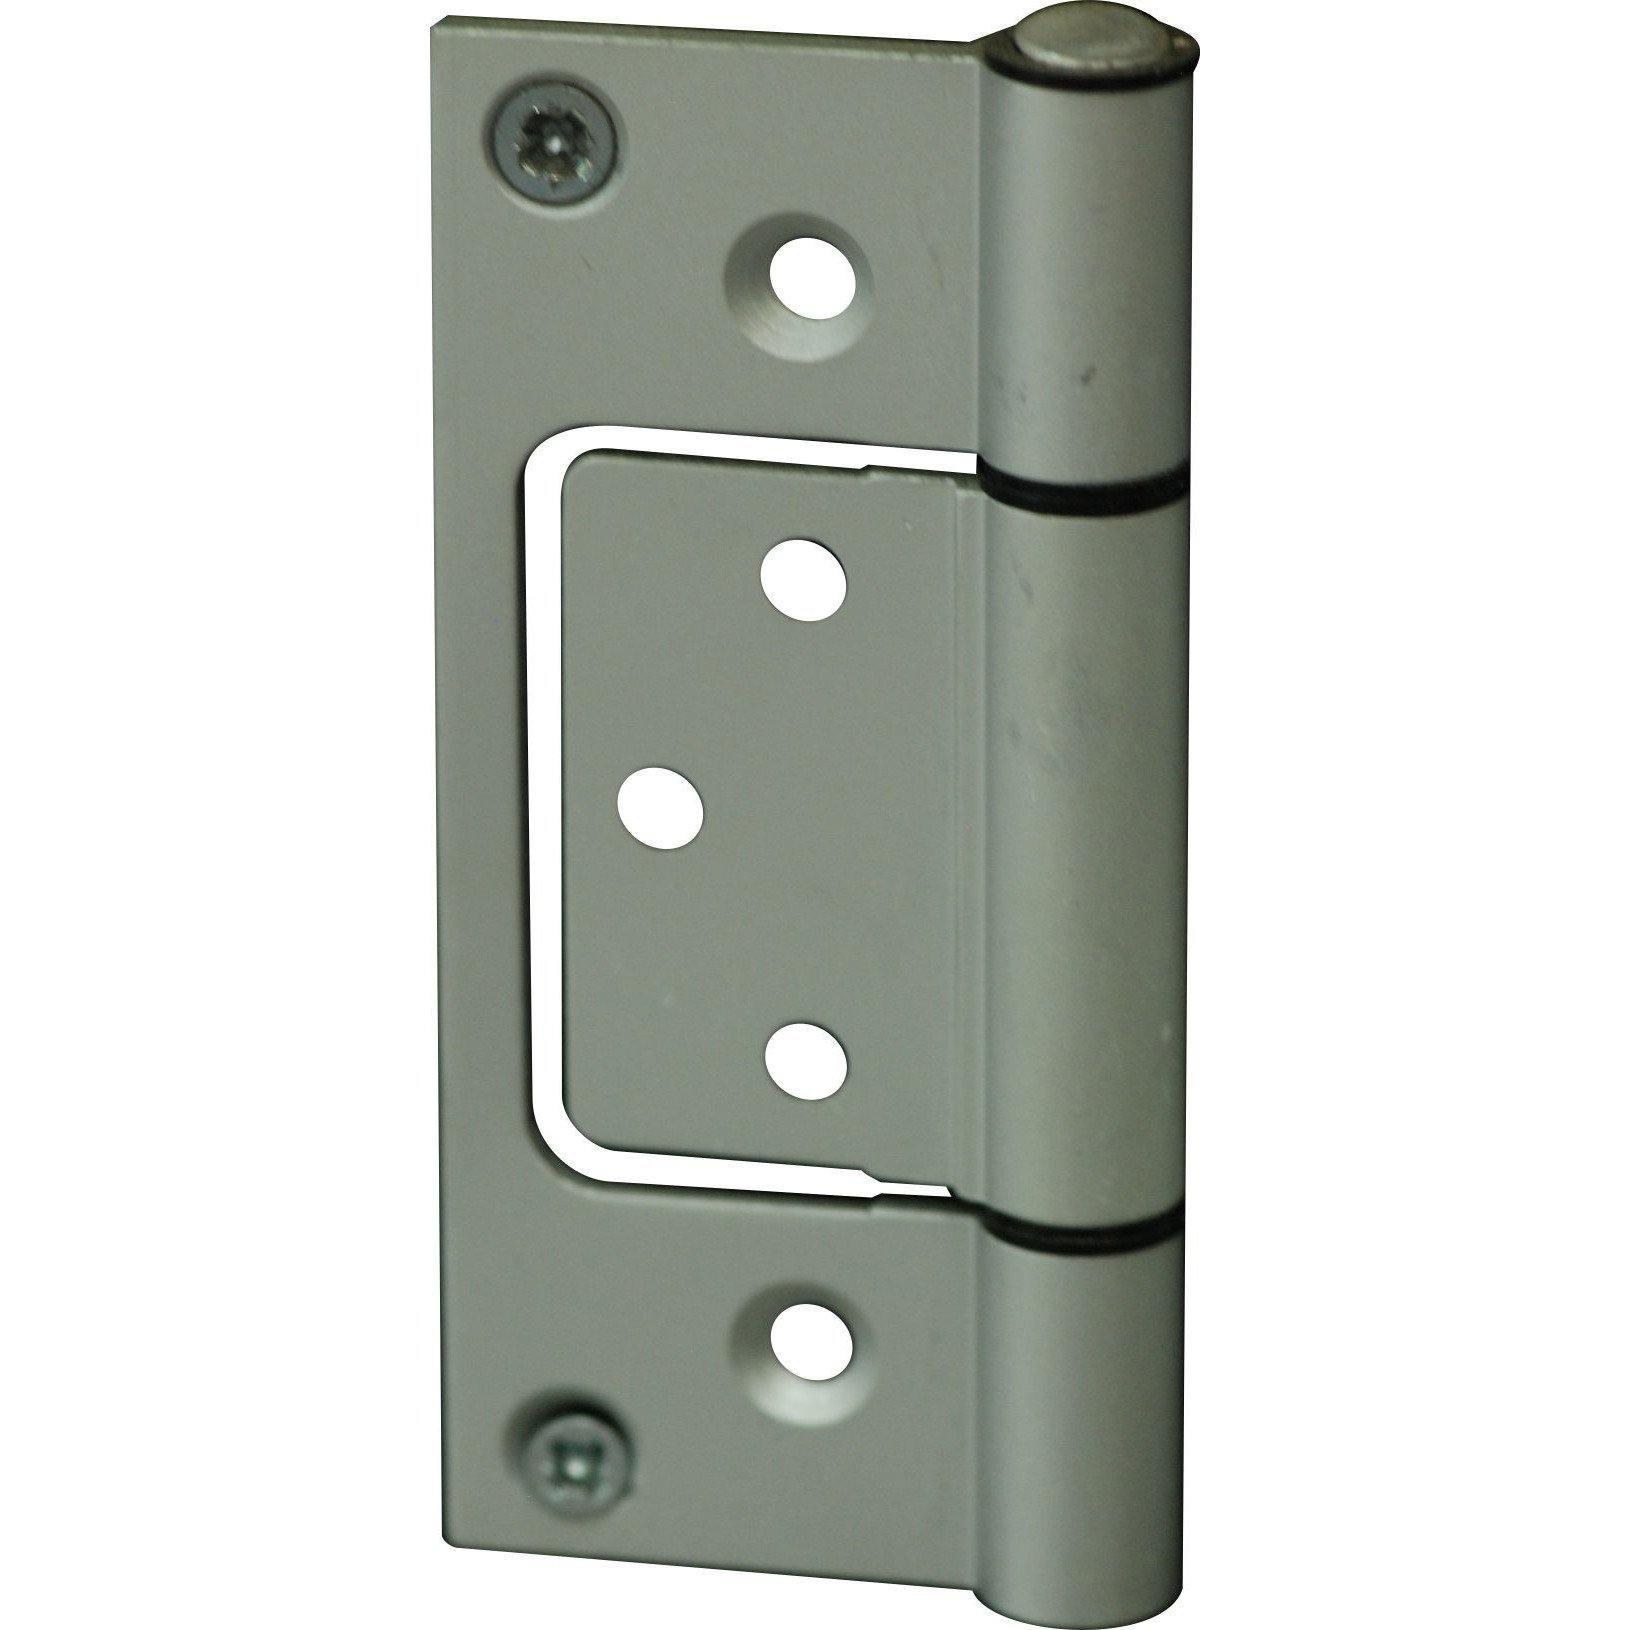 Aluminium sinkless hinge